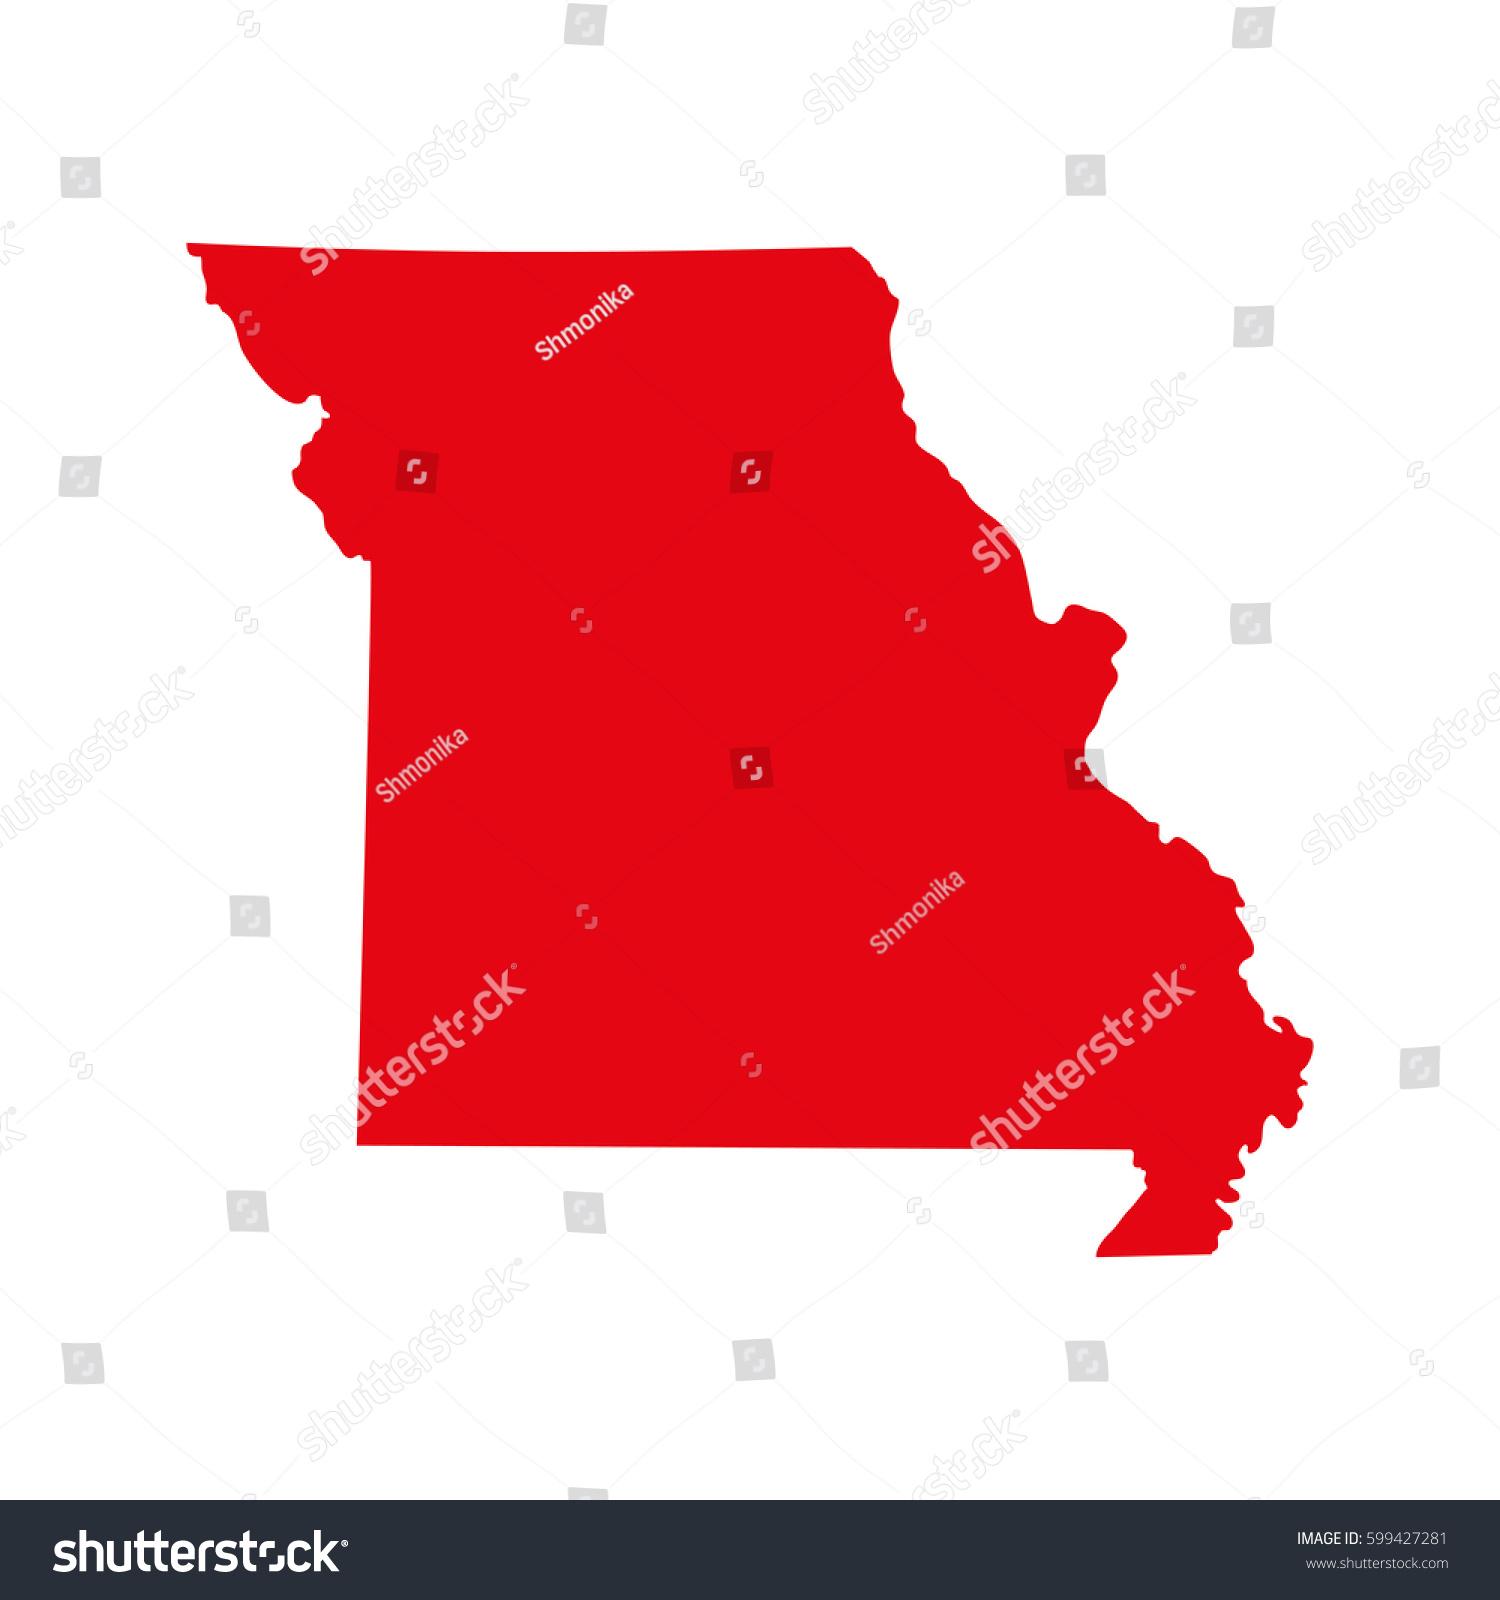 Missouri County Map US Missouri On The Map My Blog Missouri Maps